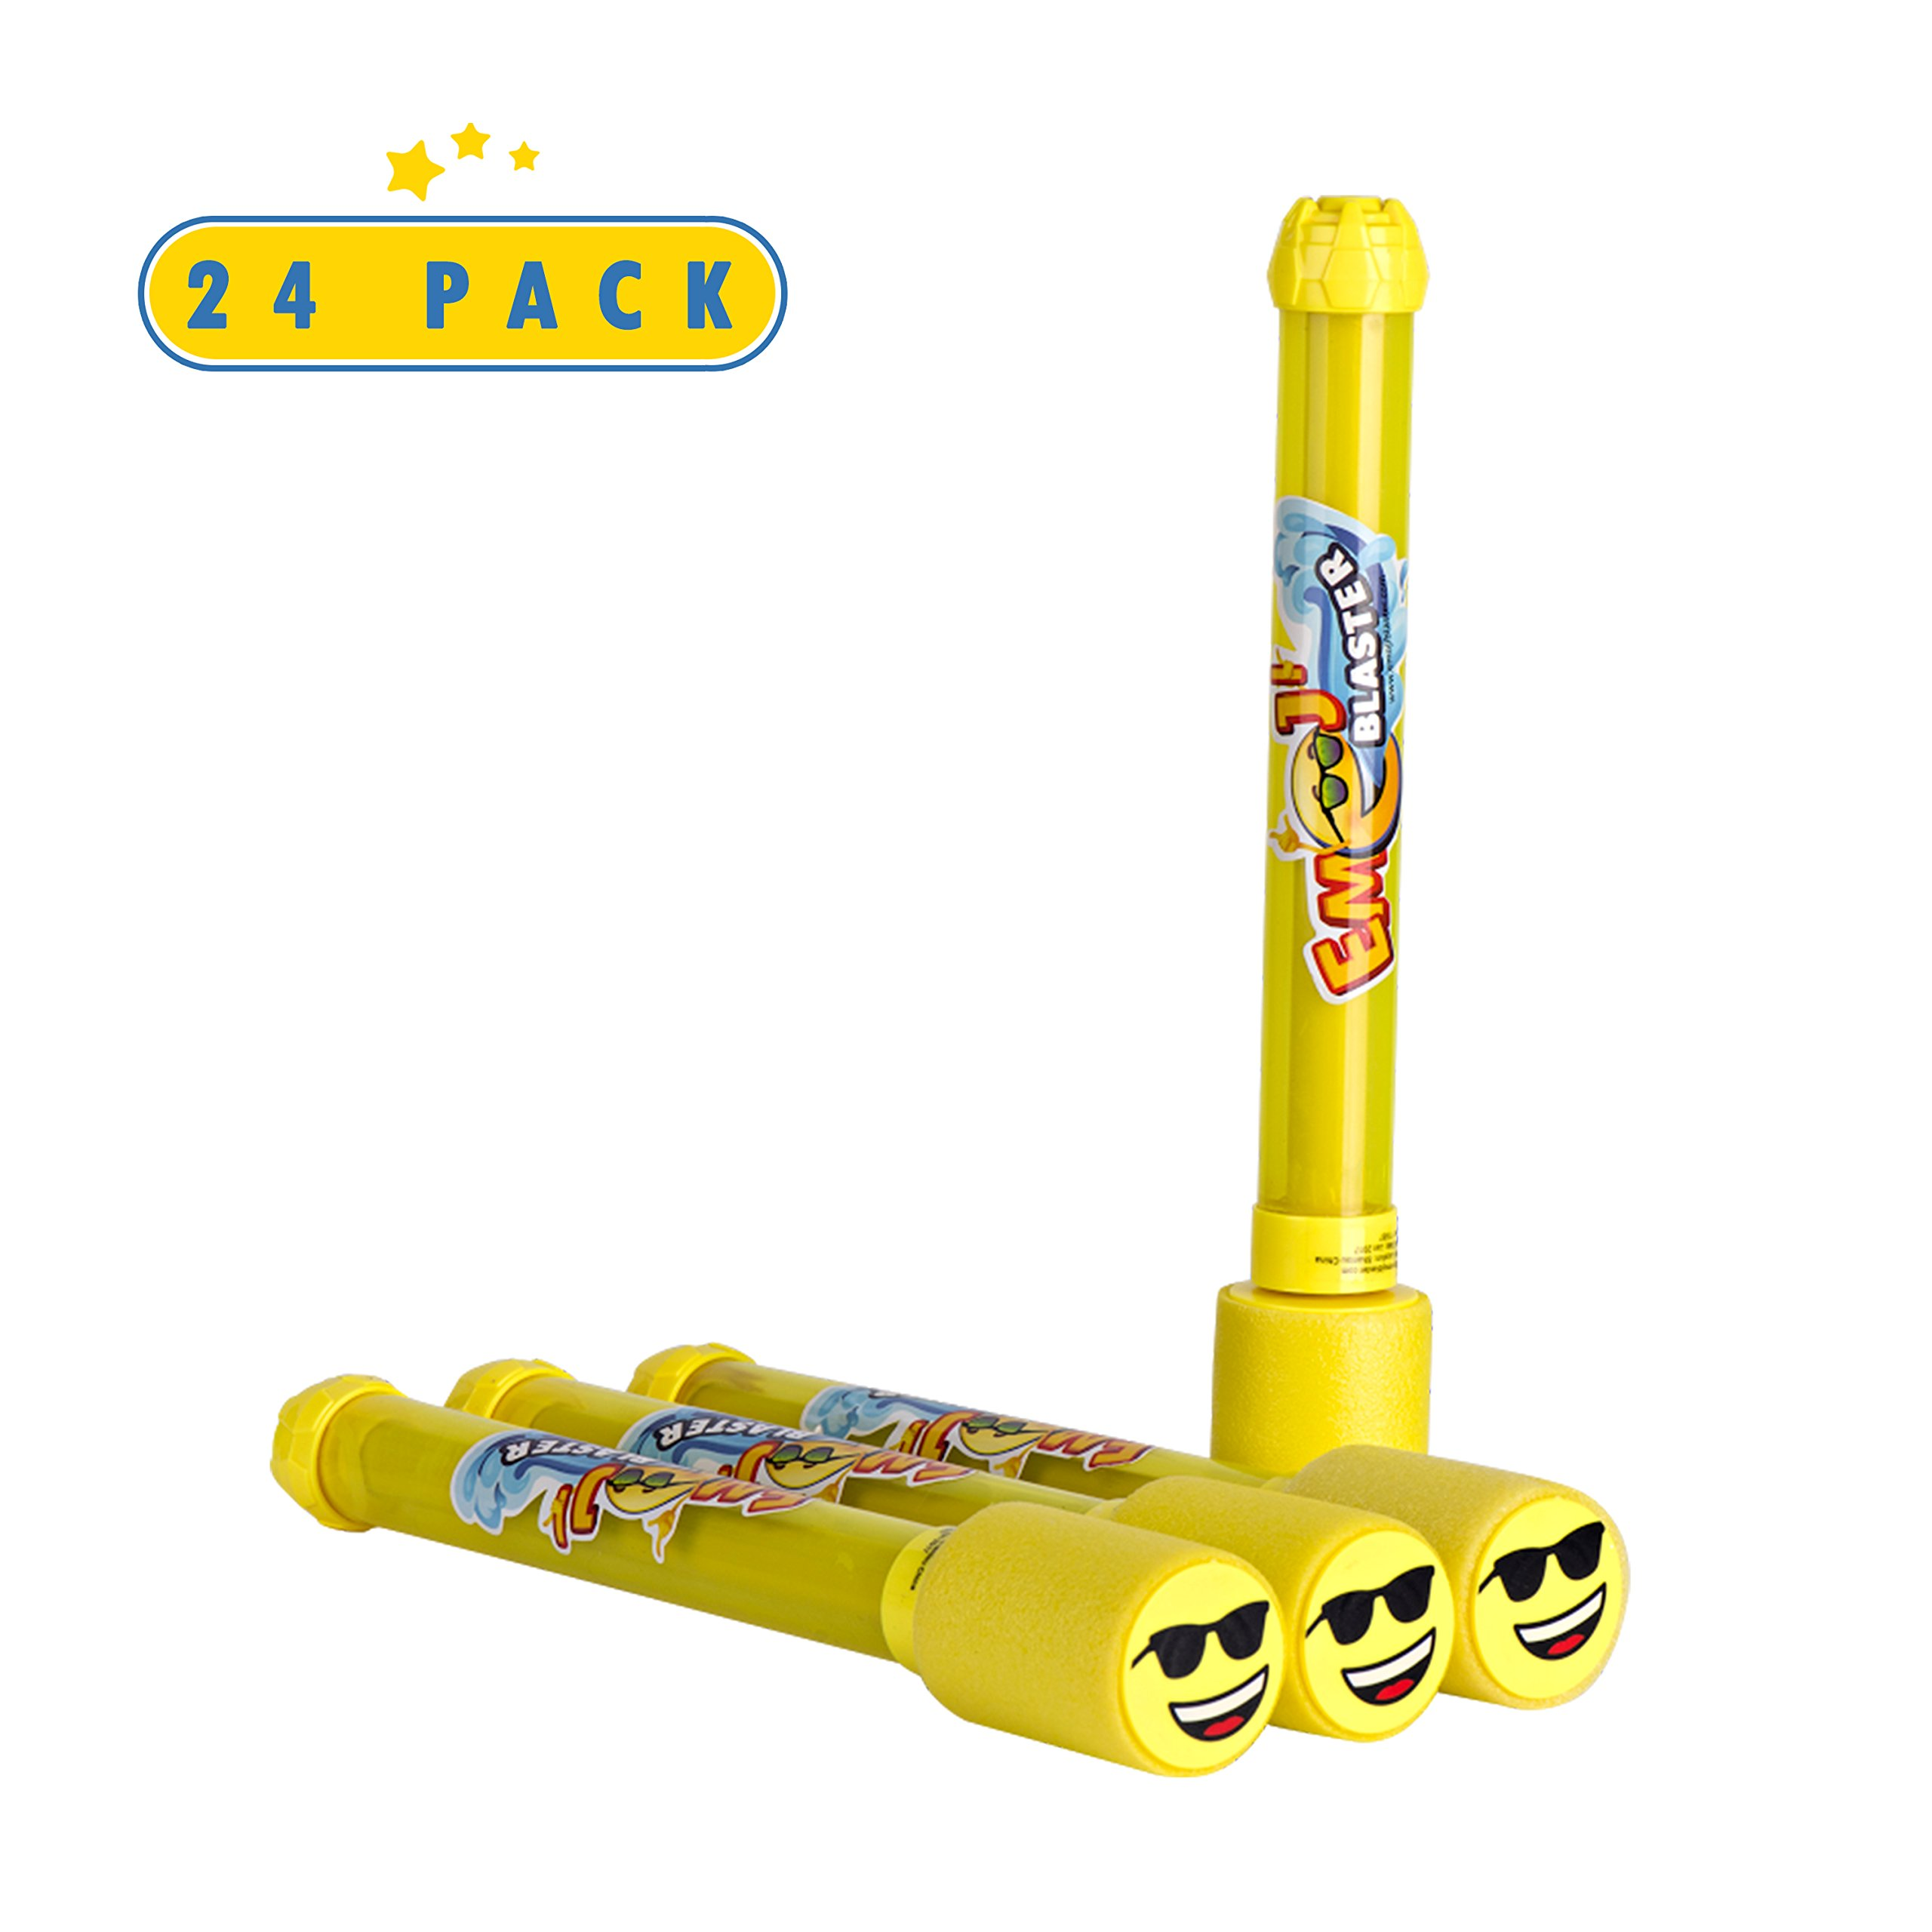 24 Pack Emoji Blaster Water Guns- Bulk Pack Water Shooters For Summer Party Favor or Activity Fun Gun For Kids- Water Gun Bundle Pack